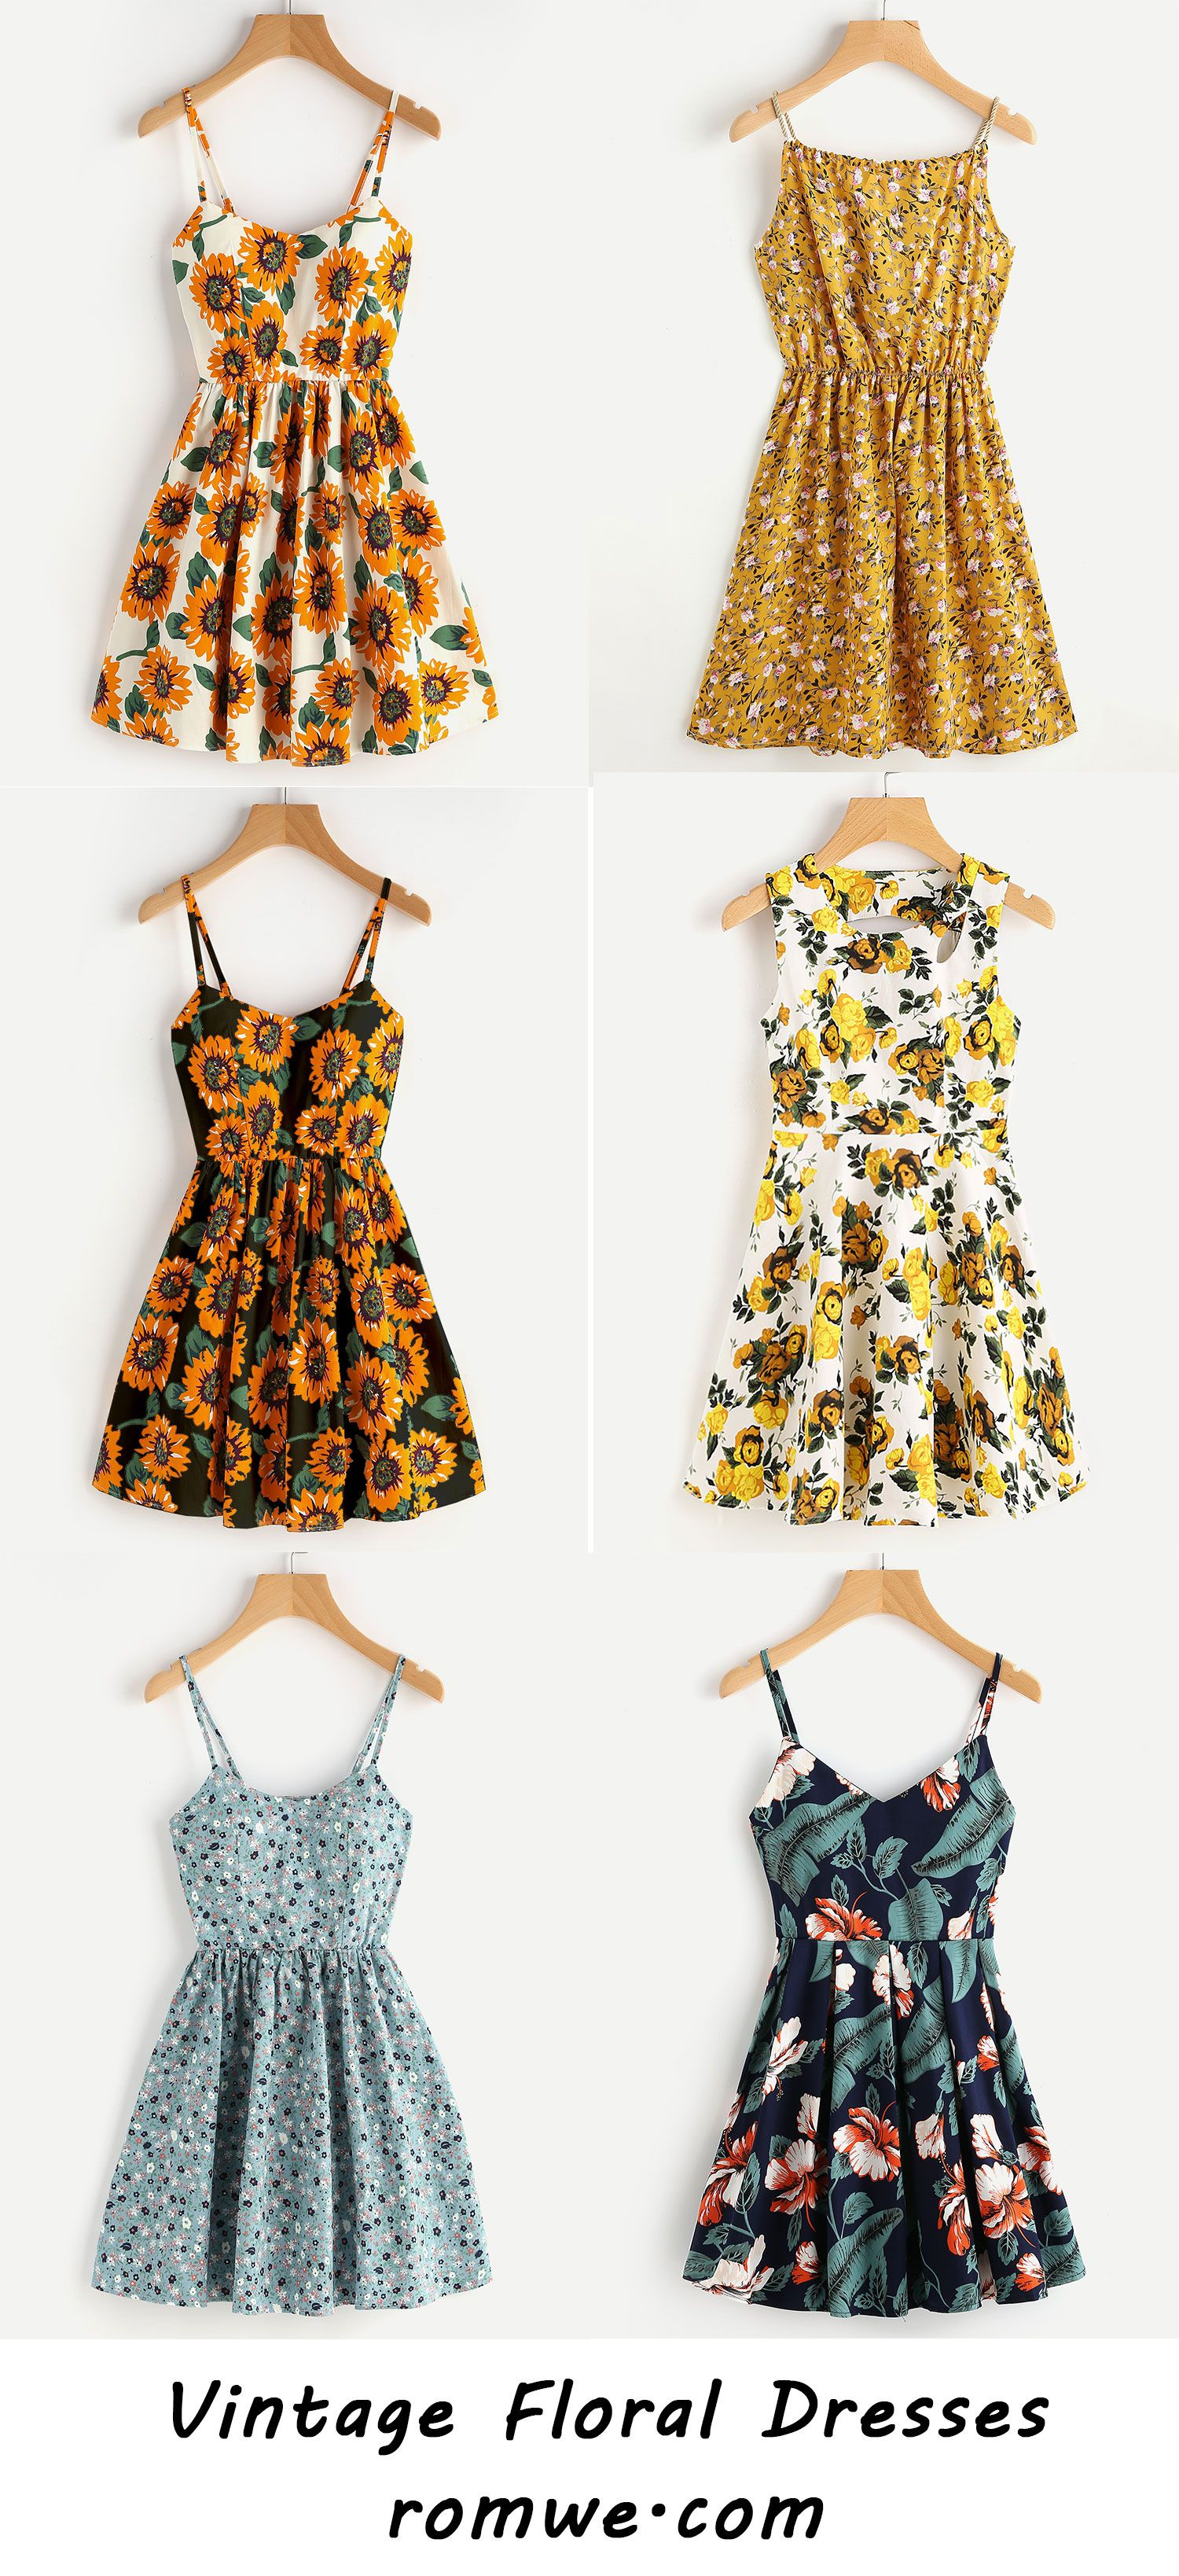 floral dresses with soft material special design and. Black Bedroom Furniture Sets. Home Design Ideas